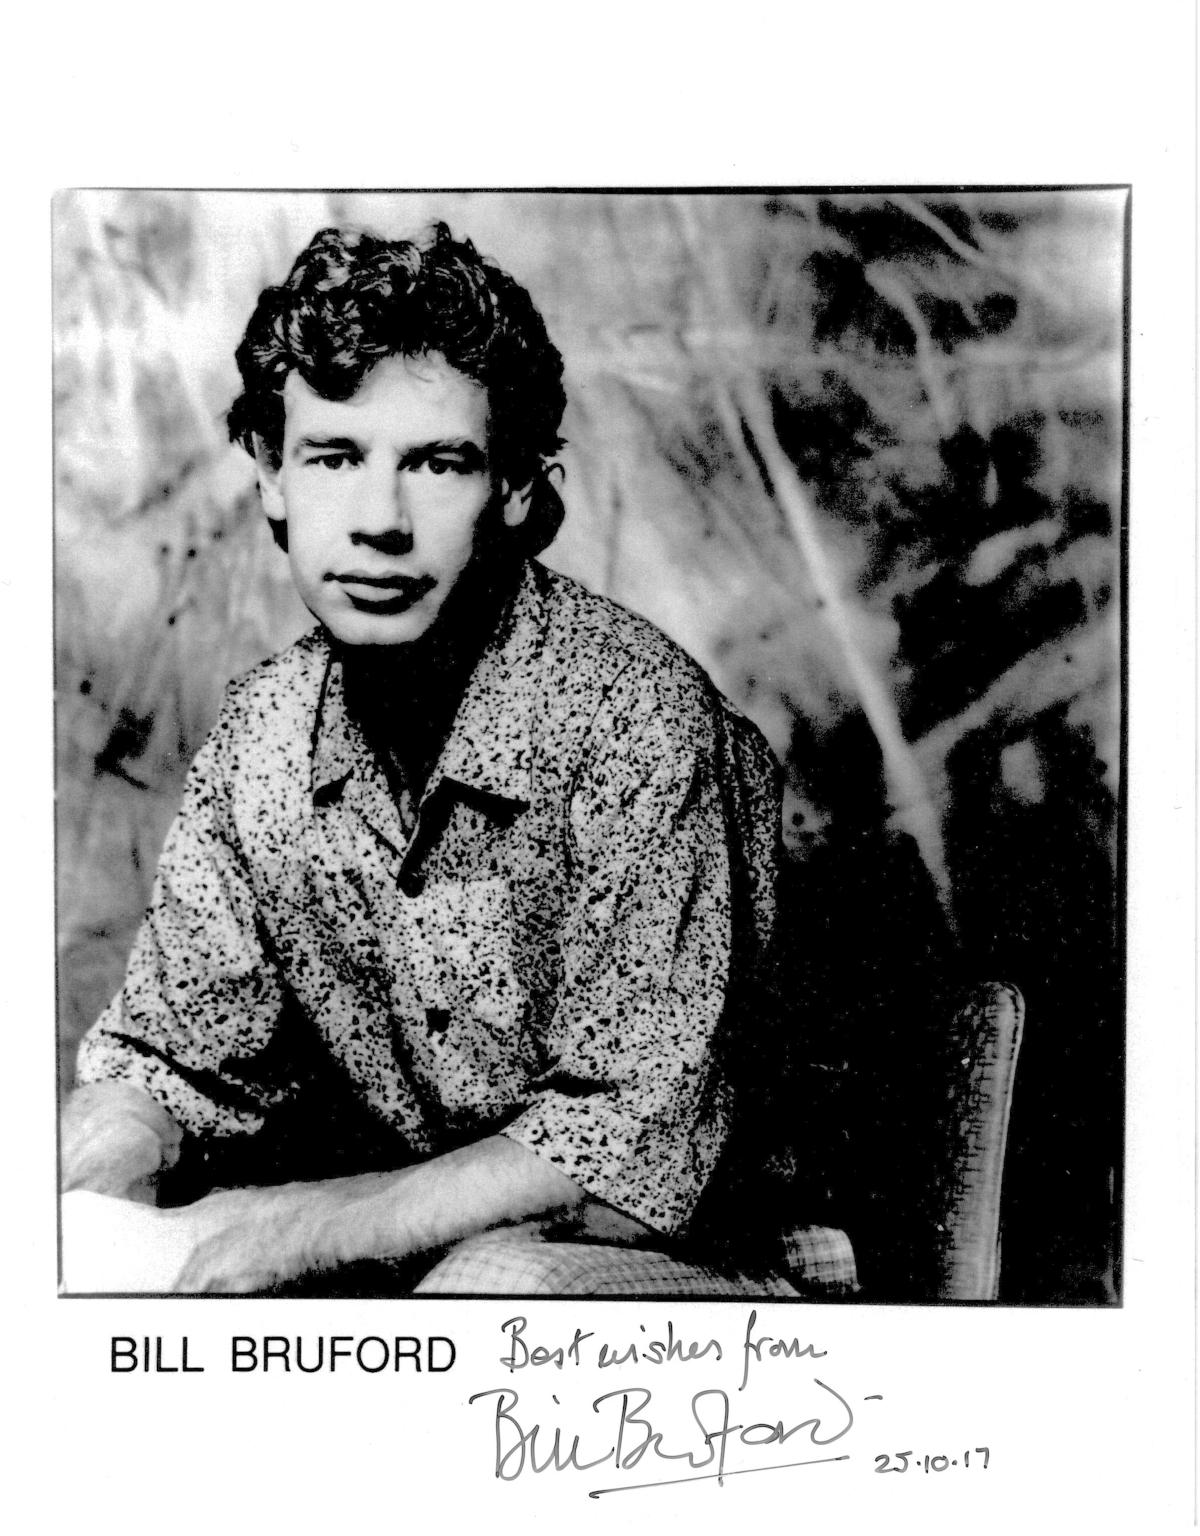 Bill Bruford #1